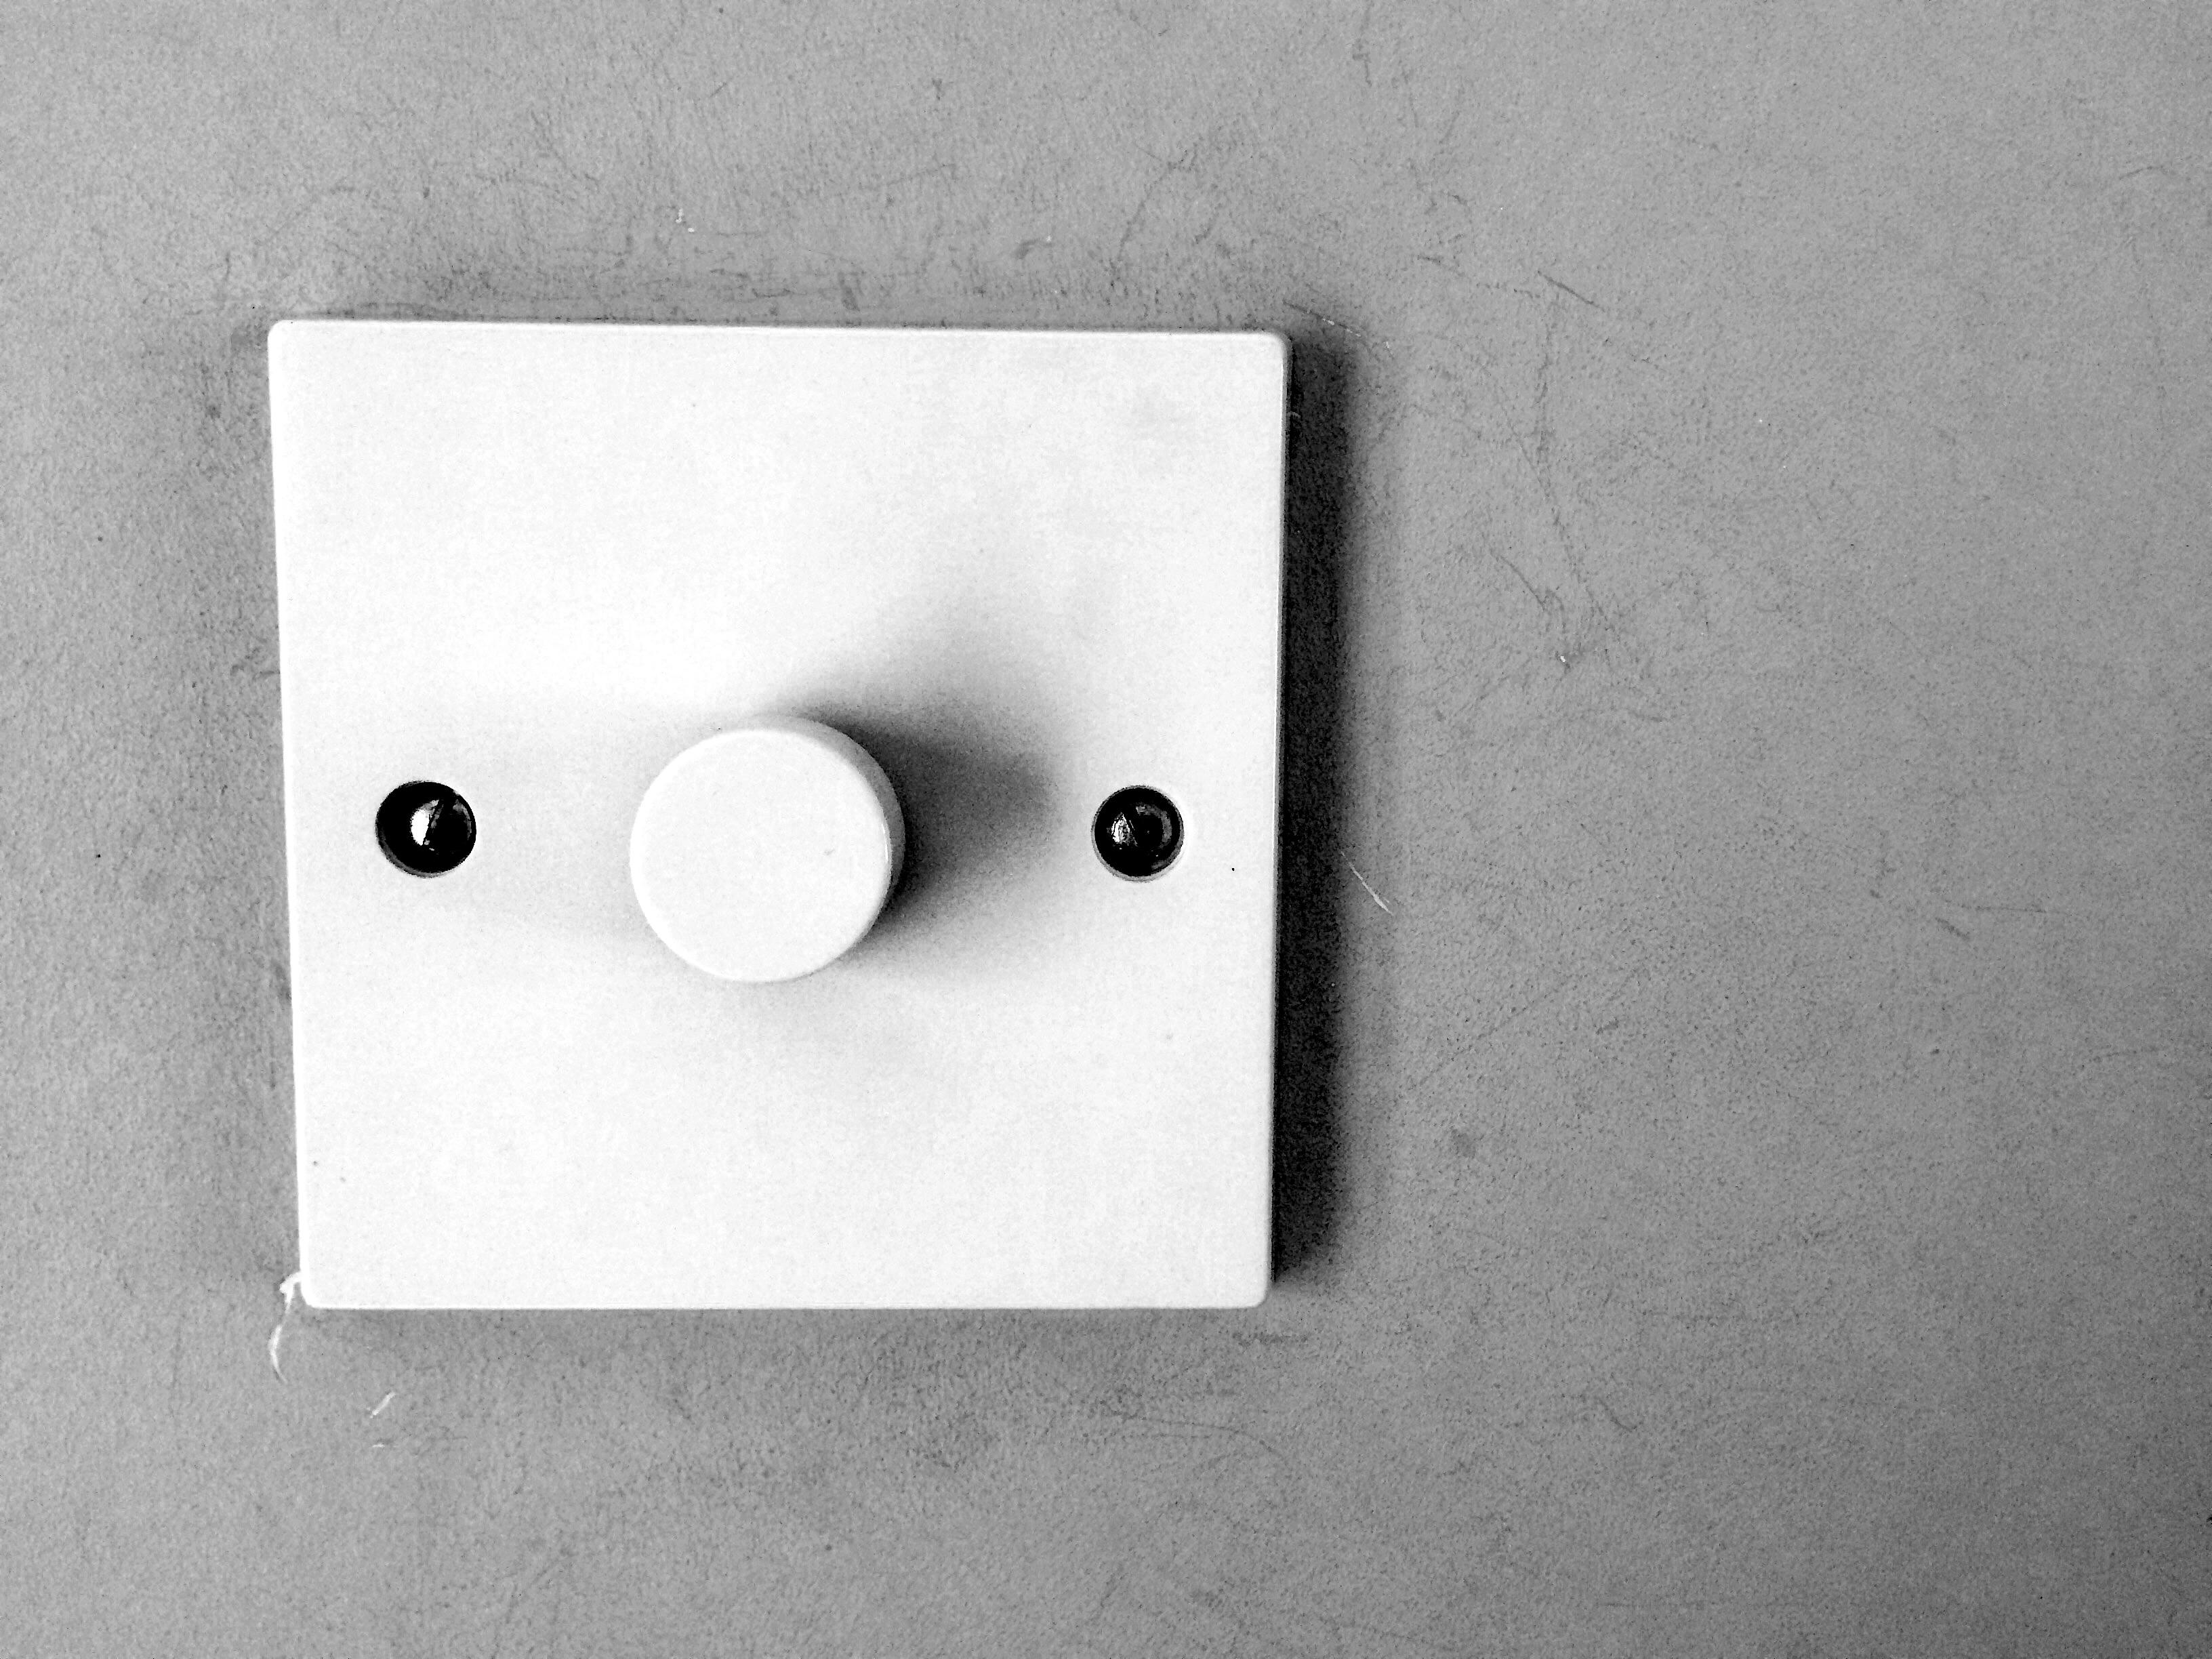 File:Dimmer Light Switch.jpg - Wikimedia Commons